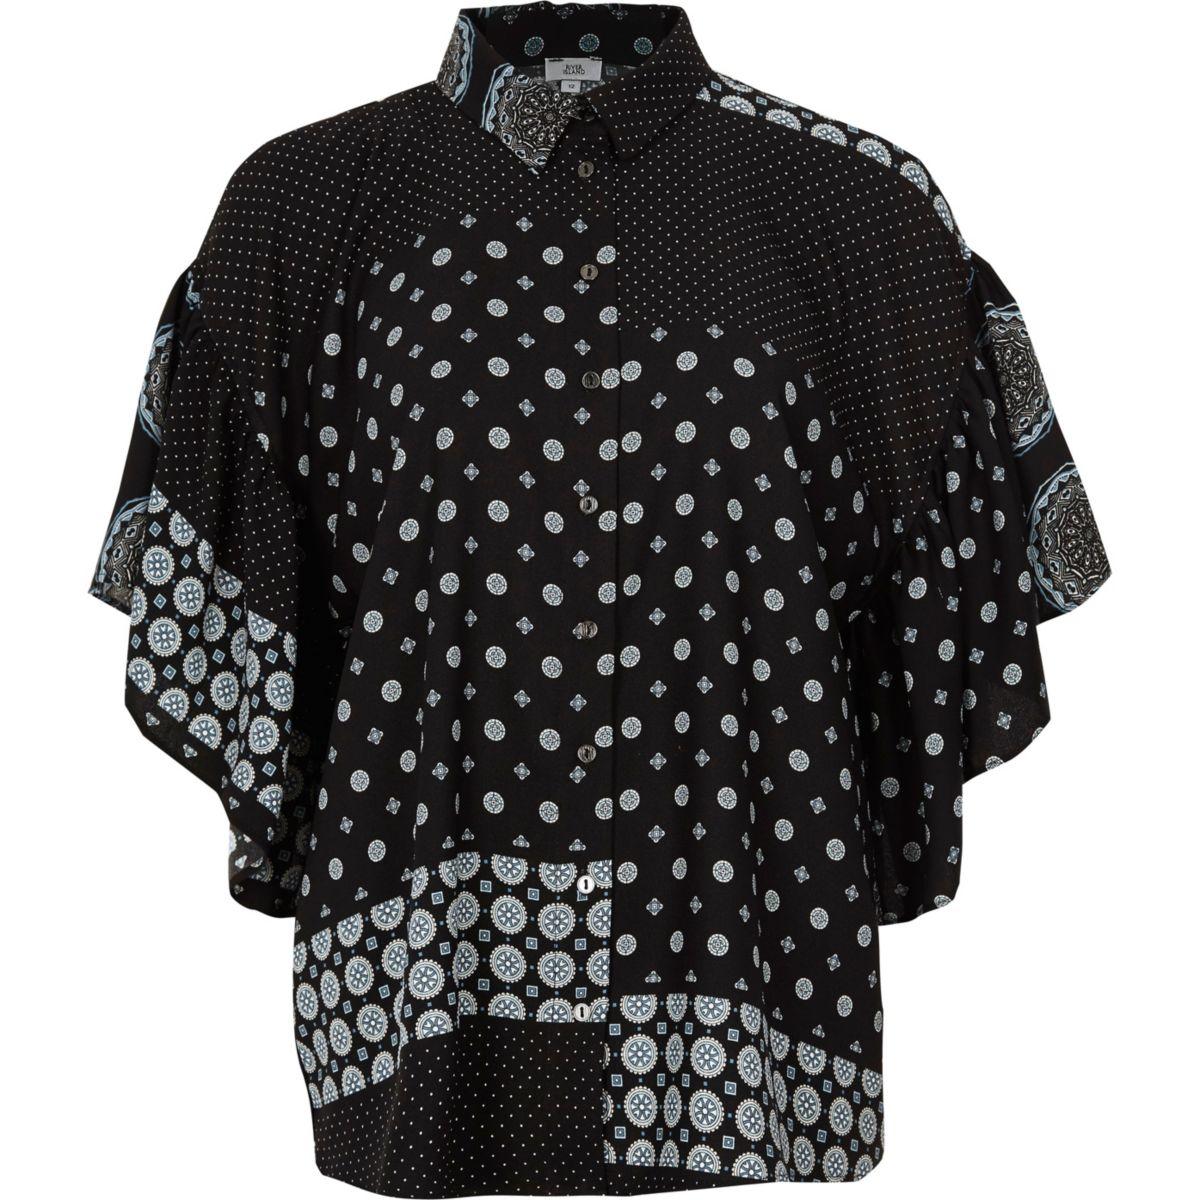 Zwarte blouse met ruches en gemixte tegelprint